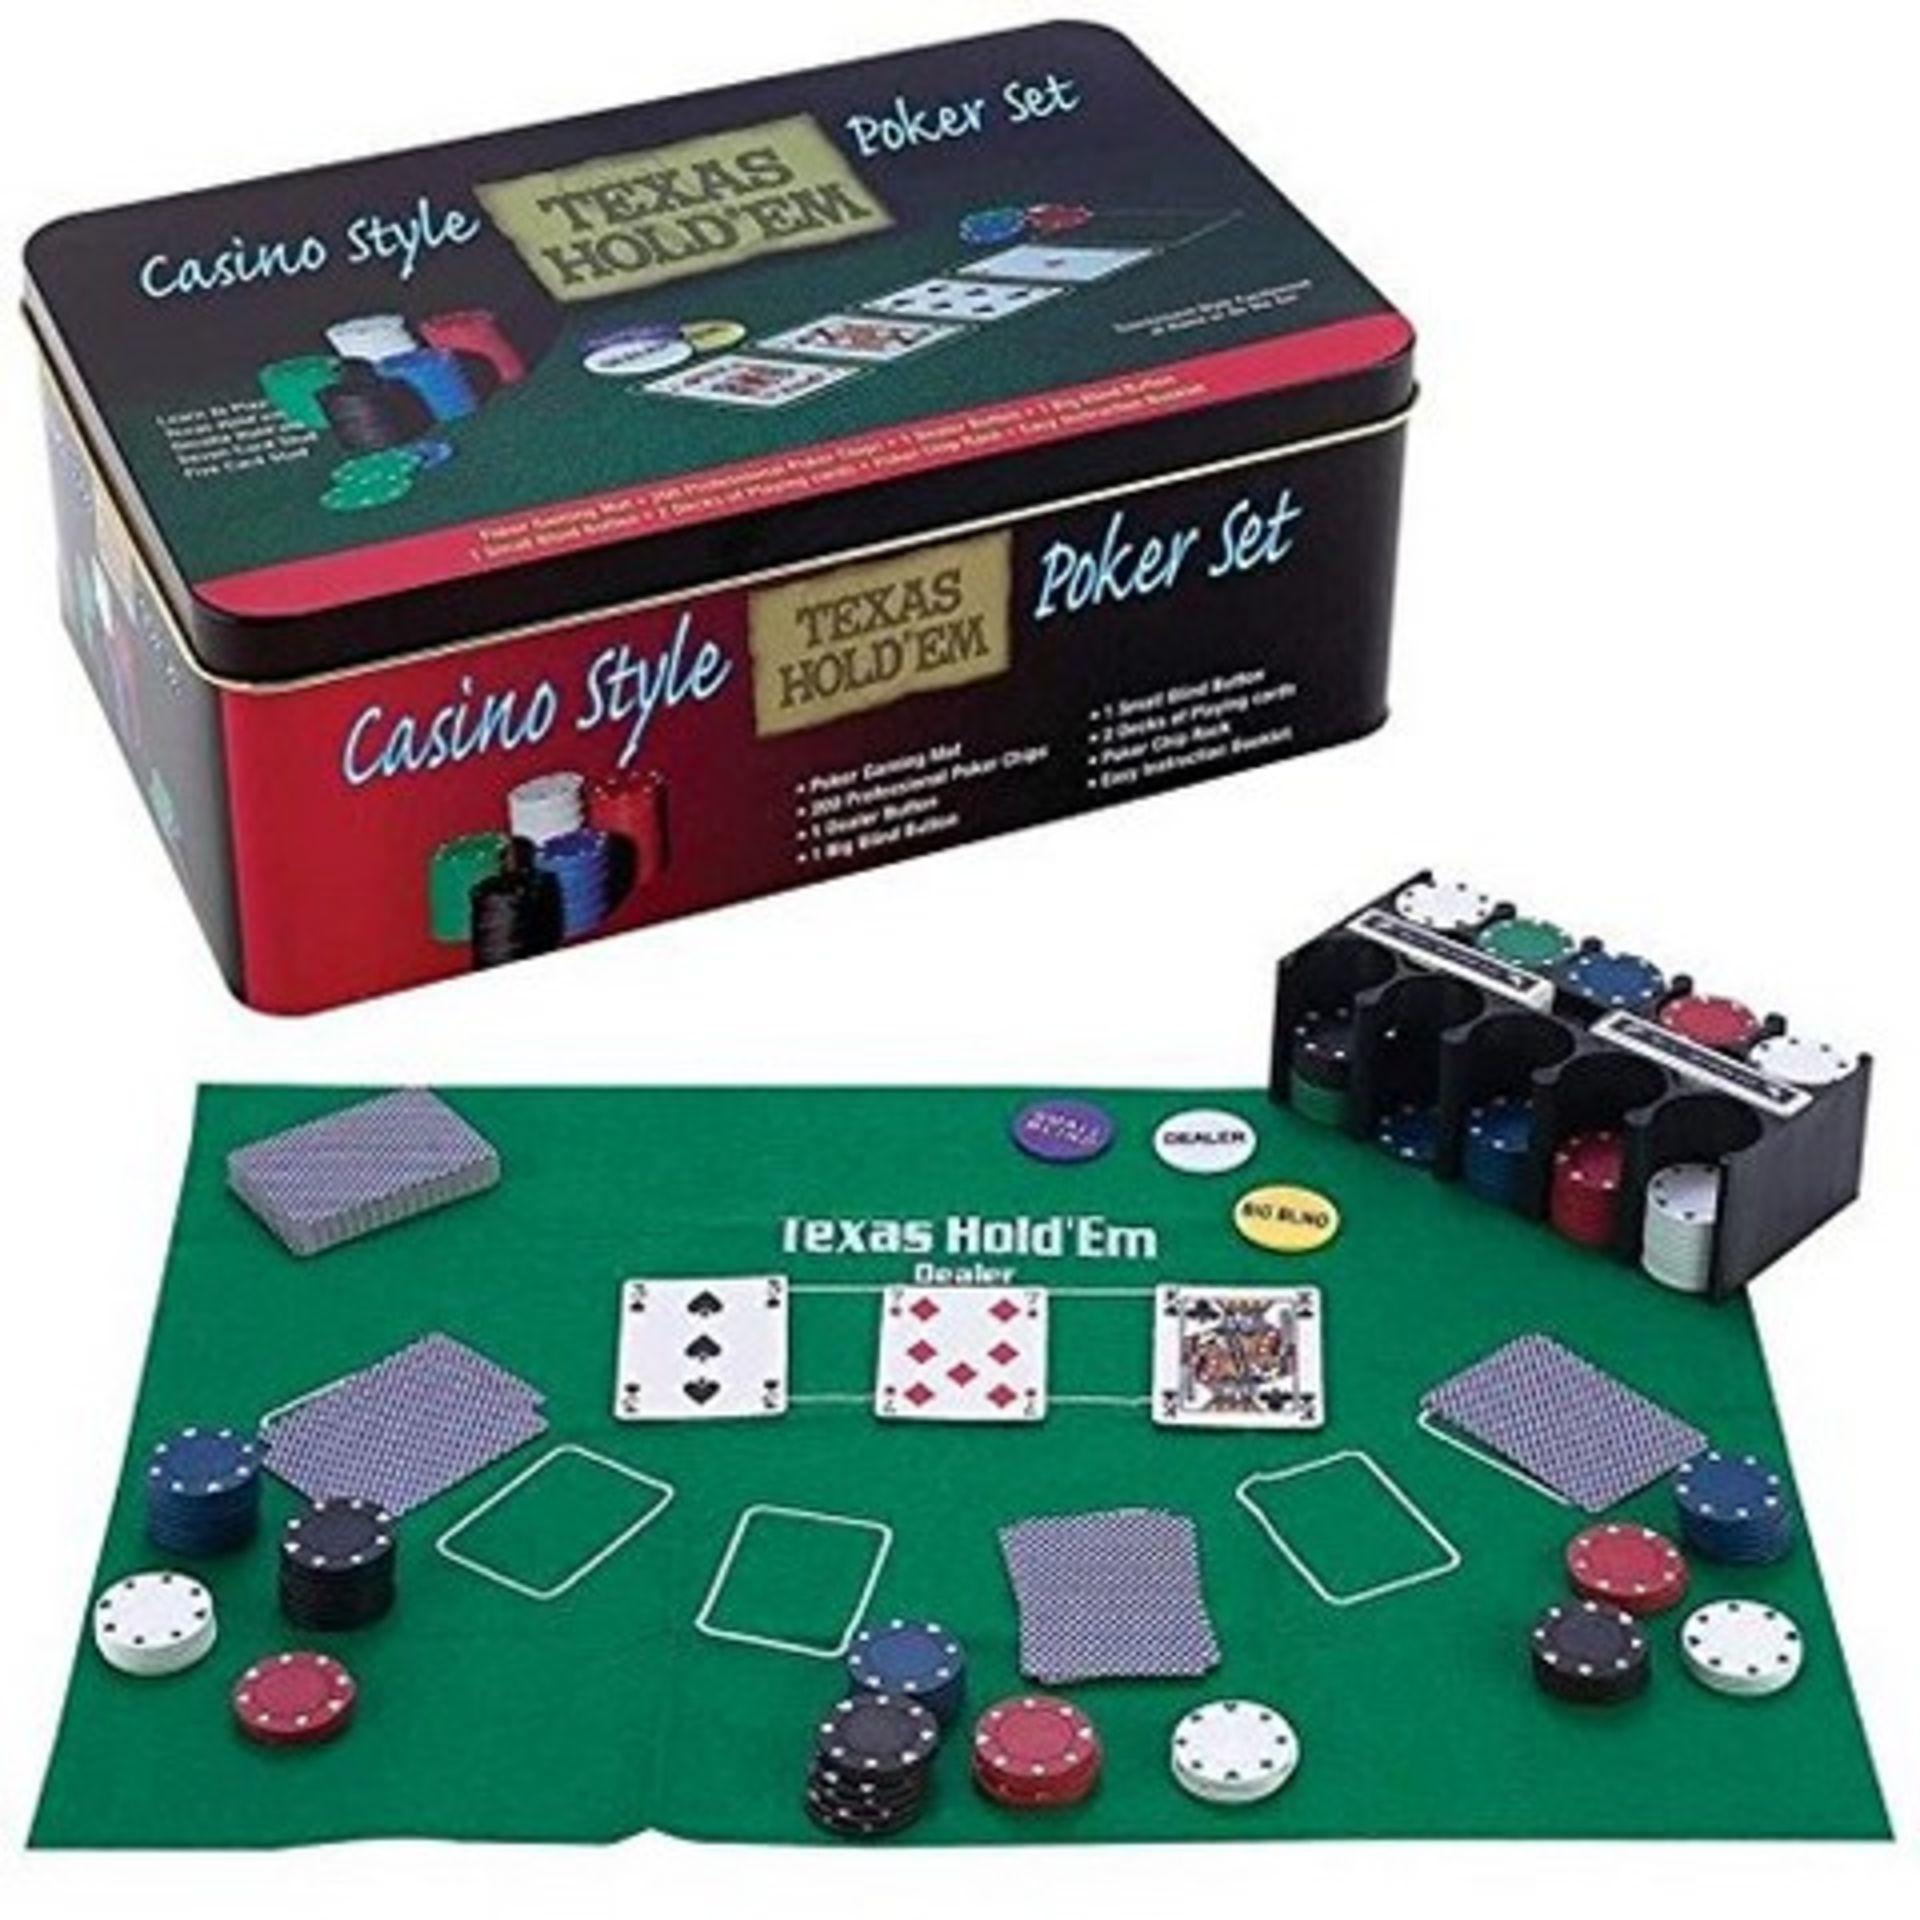 Lot 12590 - V Brand New Texas Holdem Casino Style Poker Set Including - Poker Gaming Mat - 200 Professional